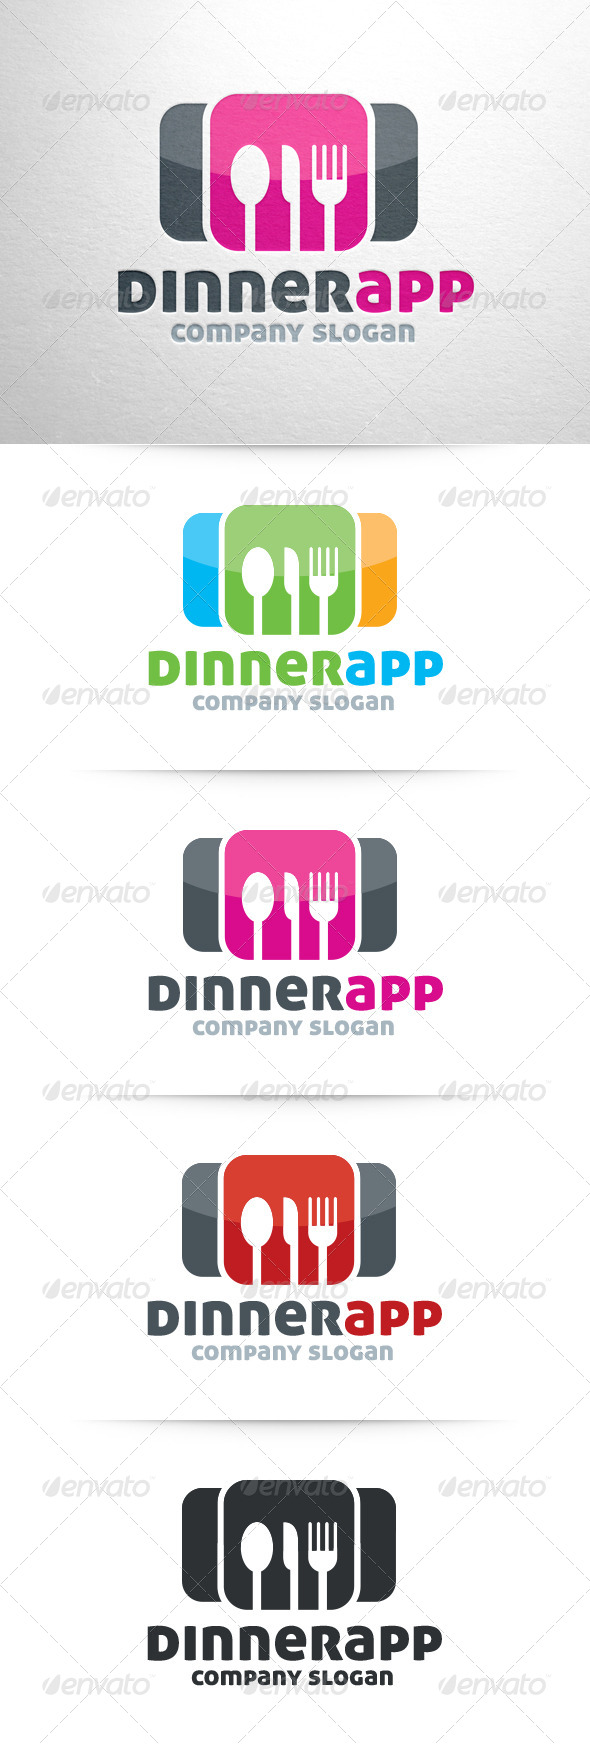 GraphicRiver Dinner App Logo Template 6592095